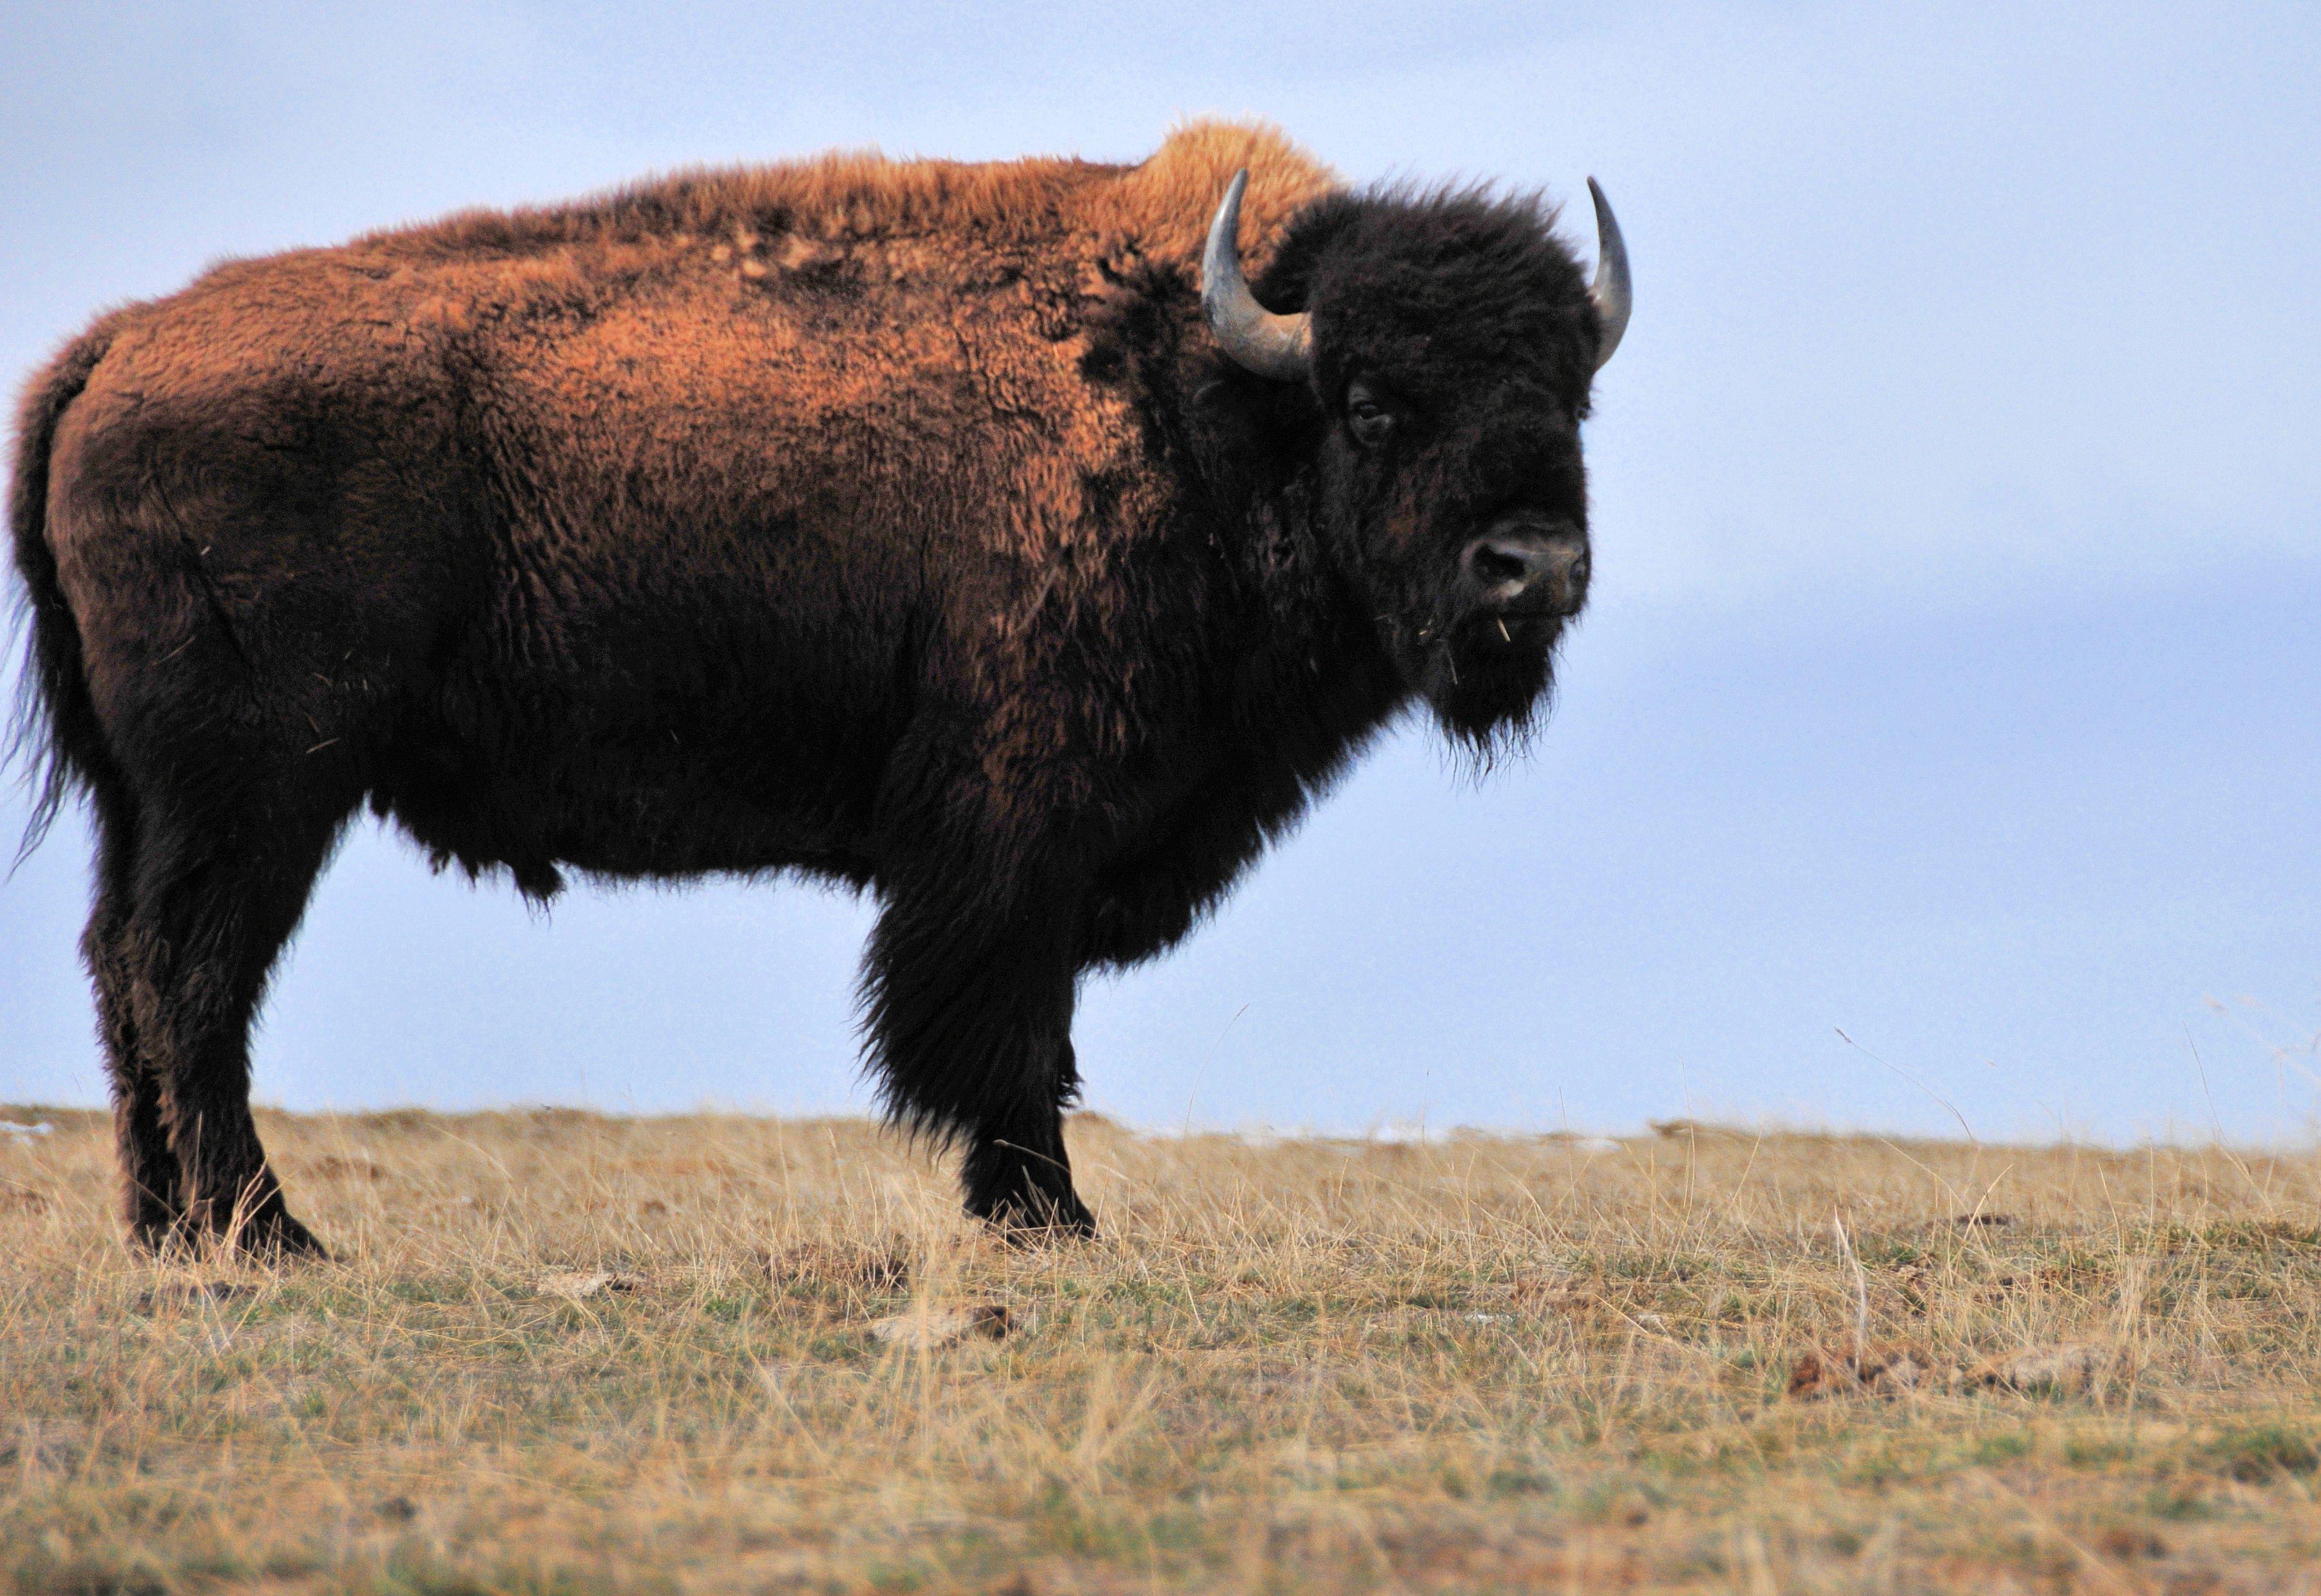 Thunder Basin National Grassland, Wyoming, USA: American Bison